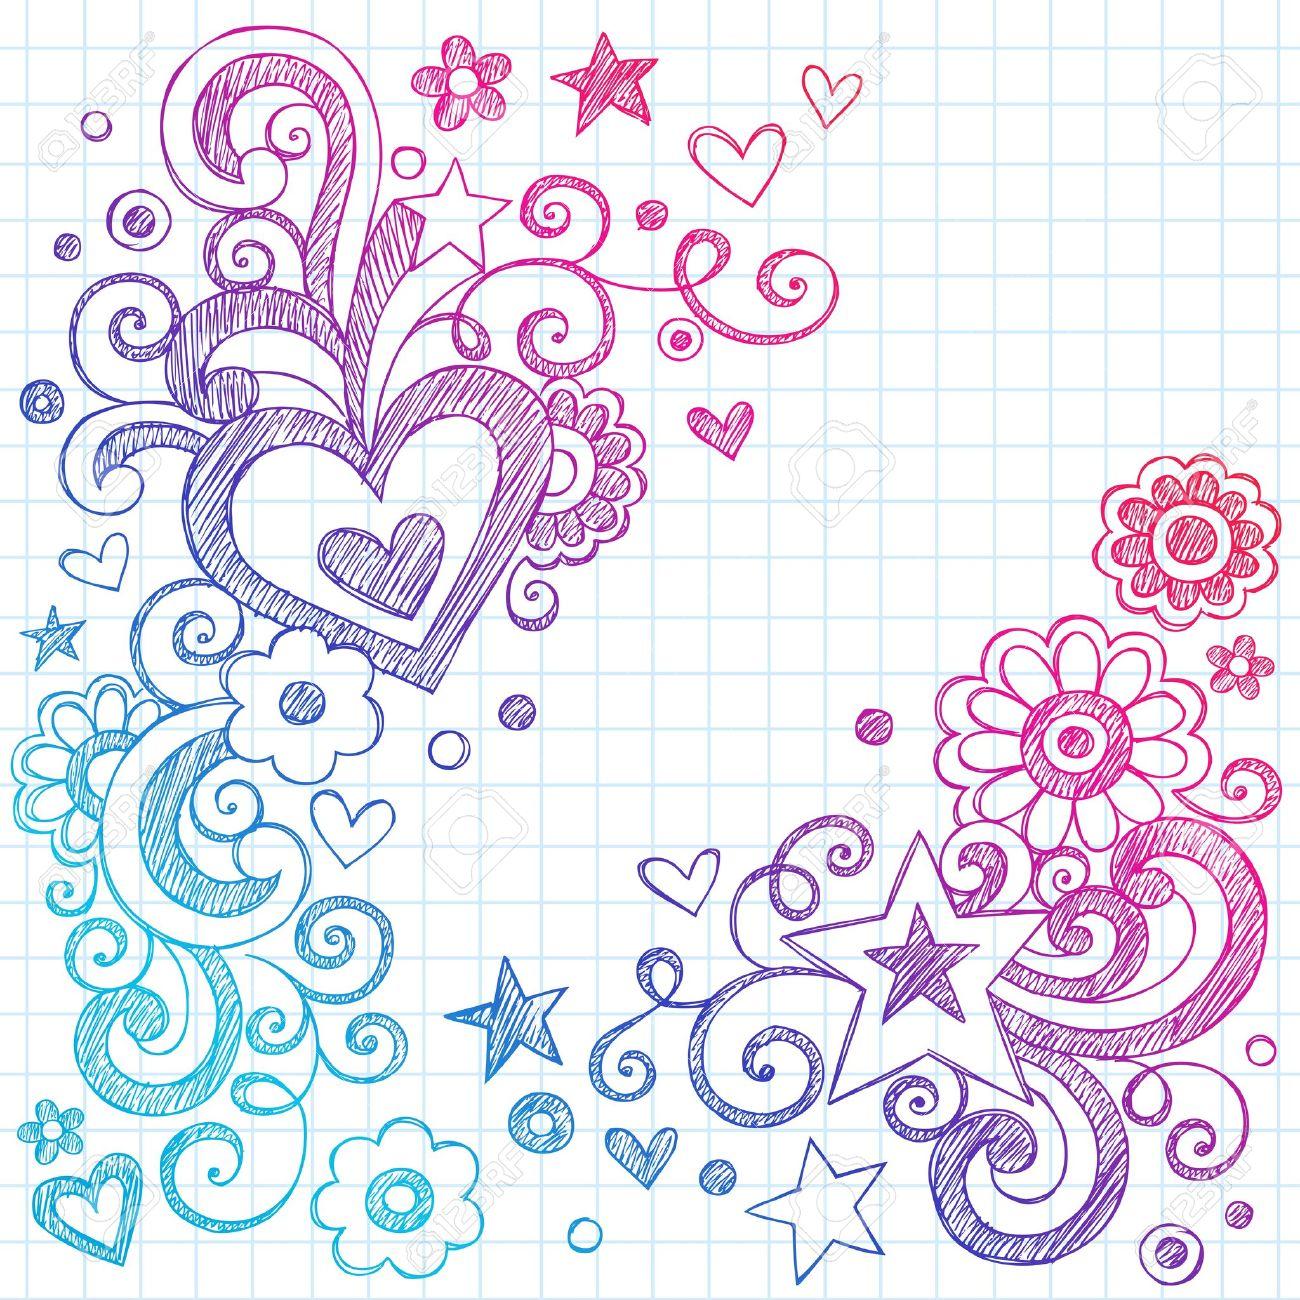 valentine s day love hearts sketchy notebook doodles design elements